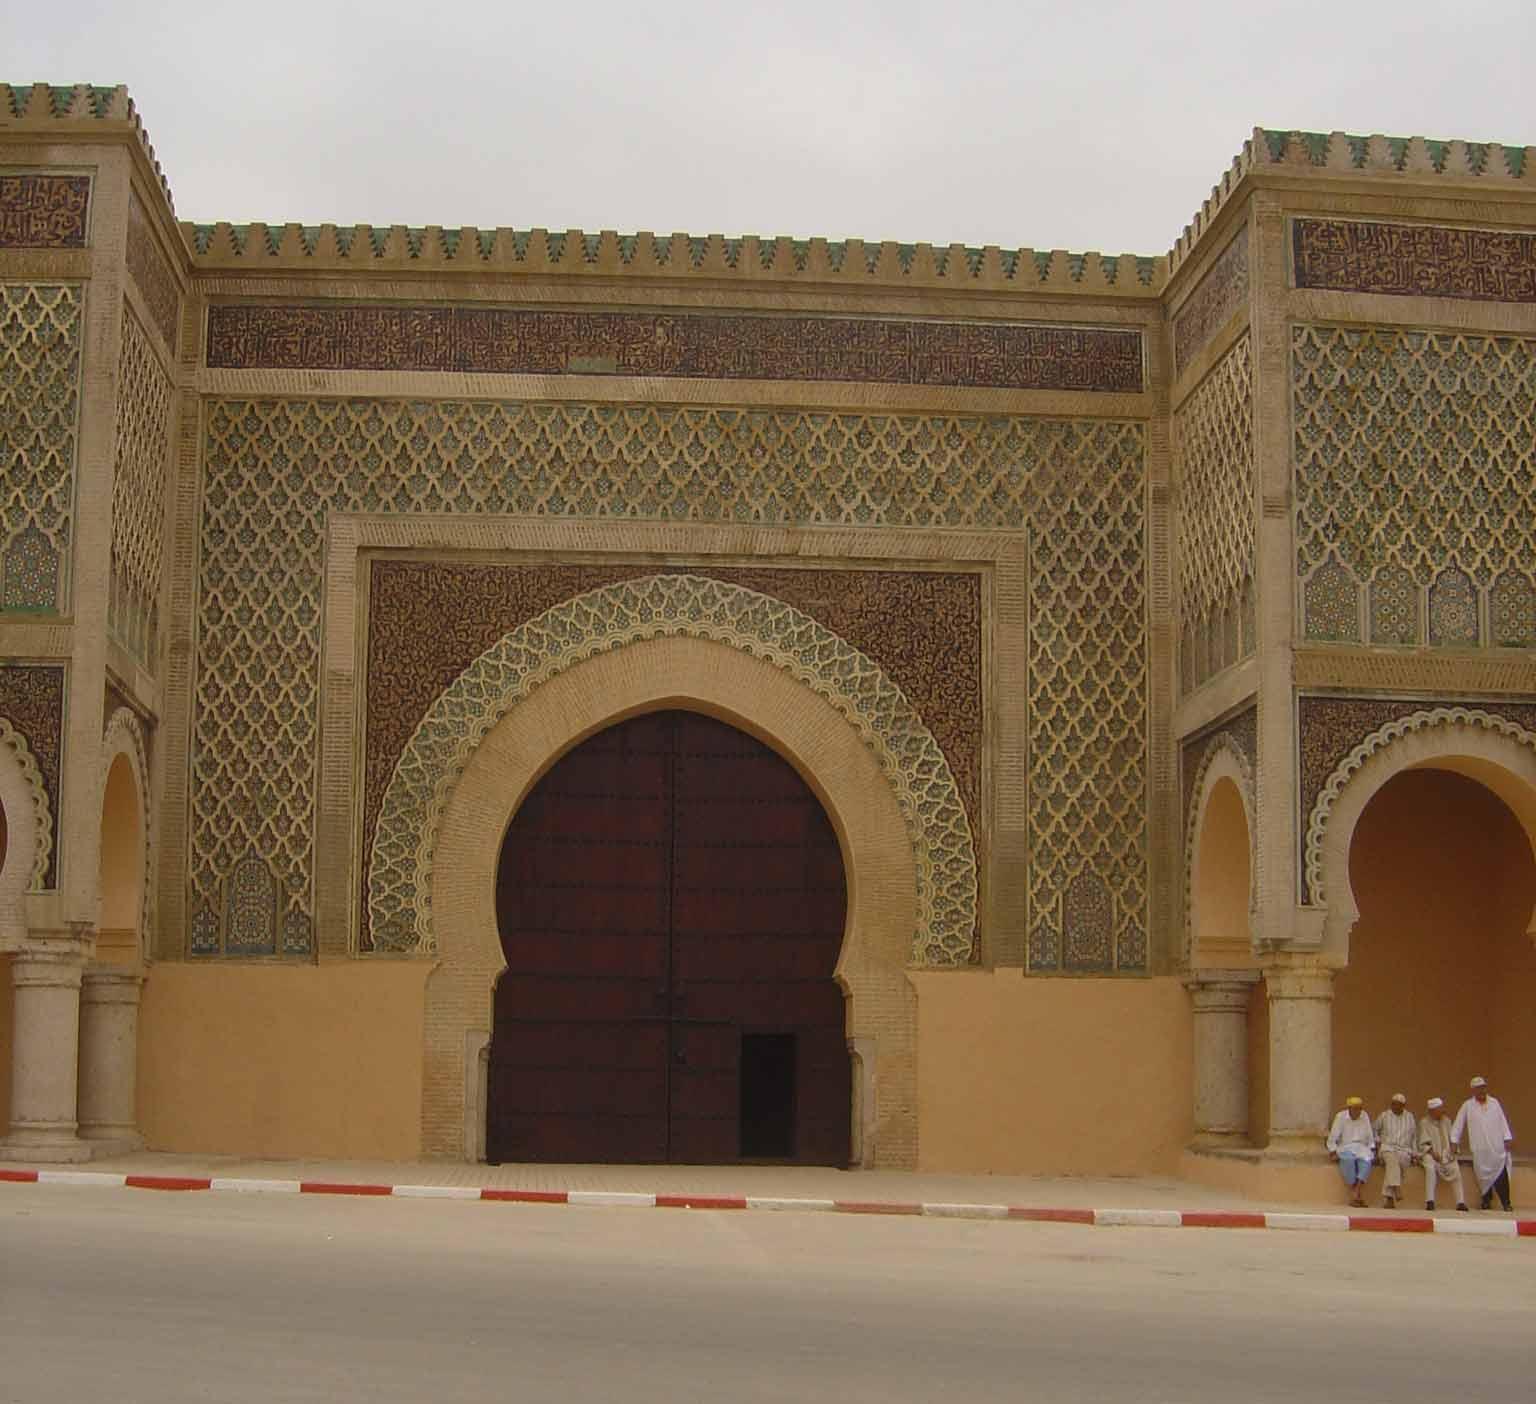 صور باب منصور مكناس بالمغرب